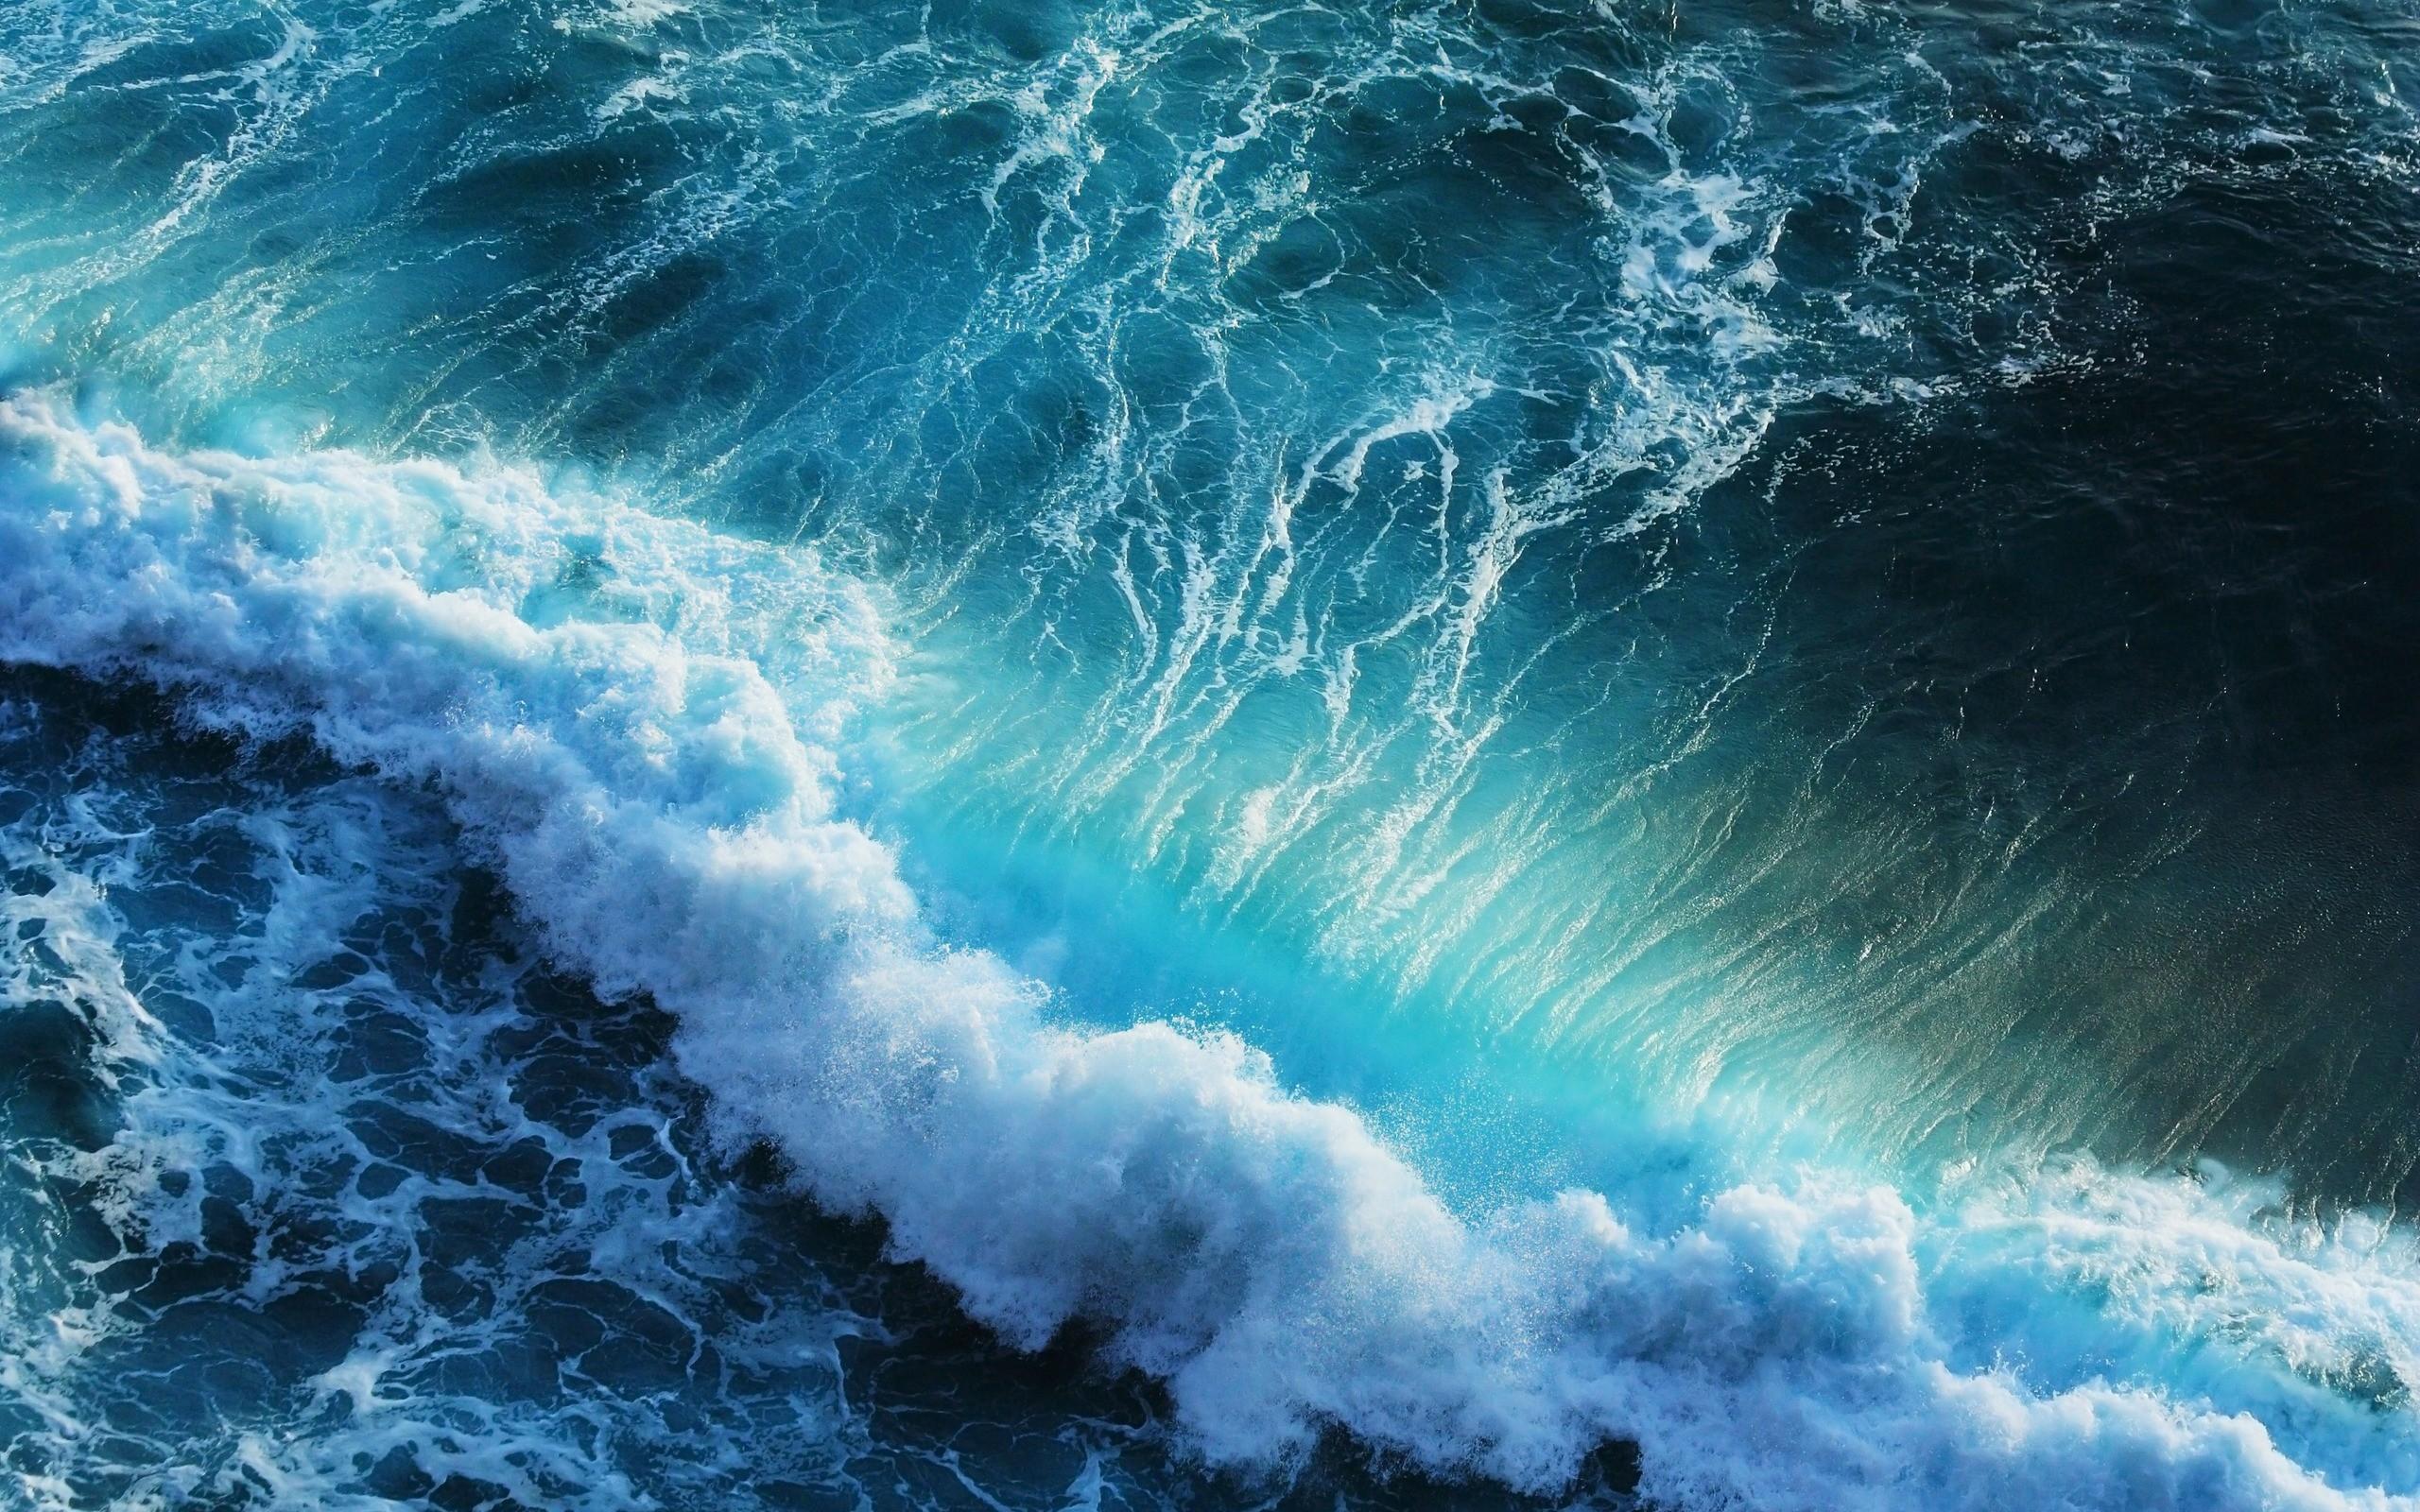 2560x1600 Blue Ocean Waves desktop PC and Mac wallpaper 2560x1600